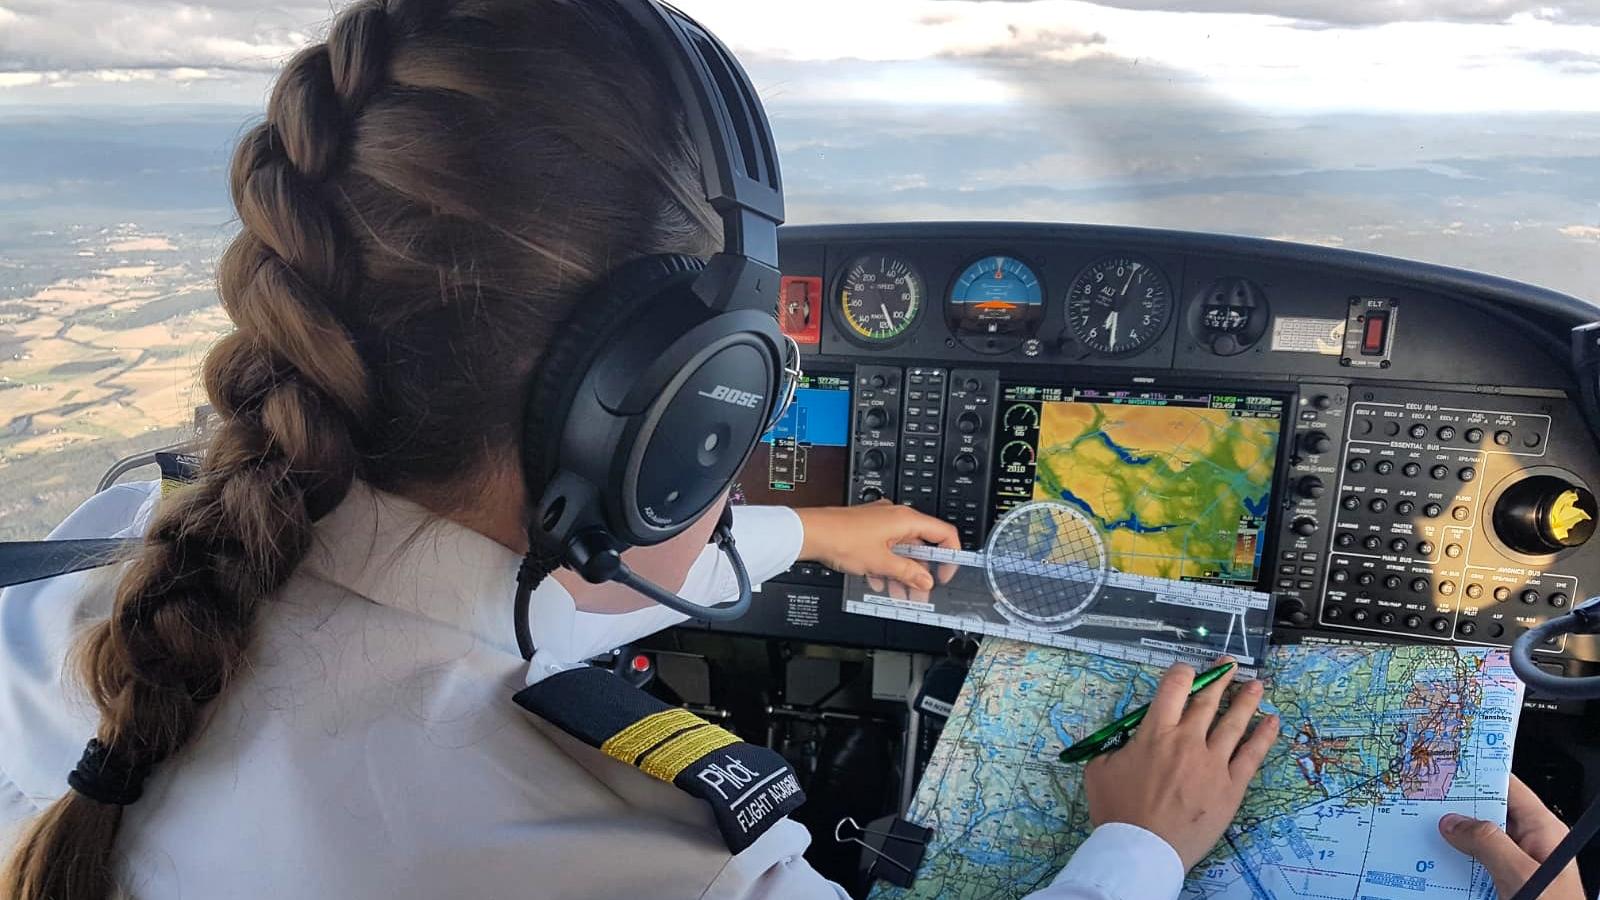 Student Taasaasen is navigation during a flight in Diamond DA40